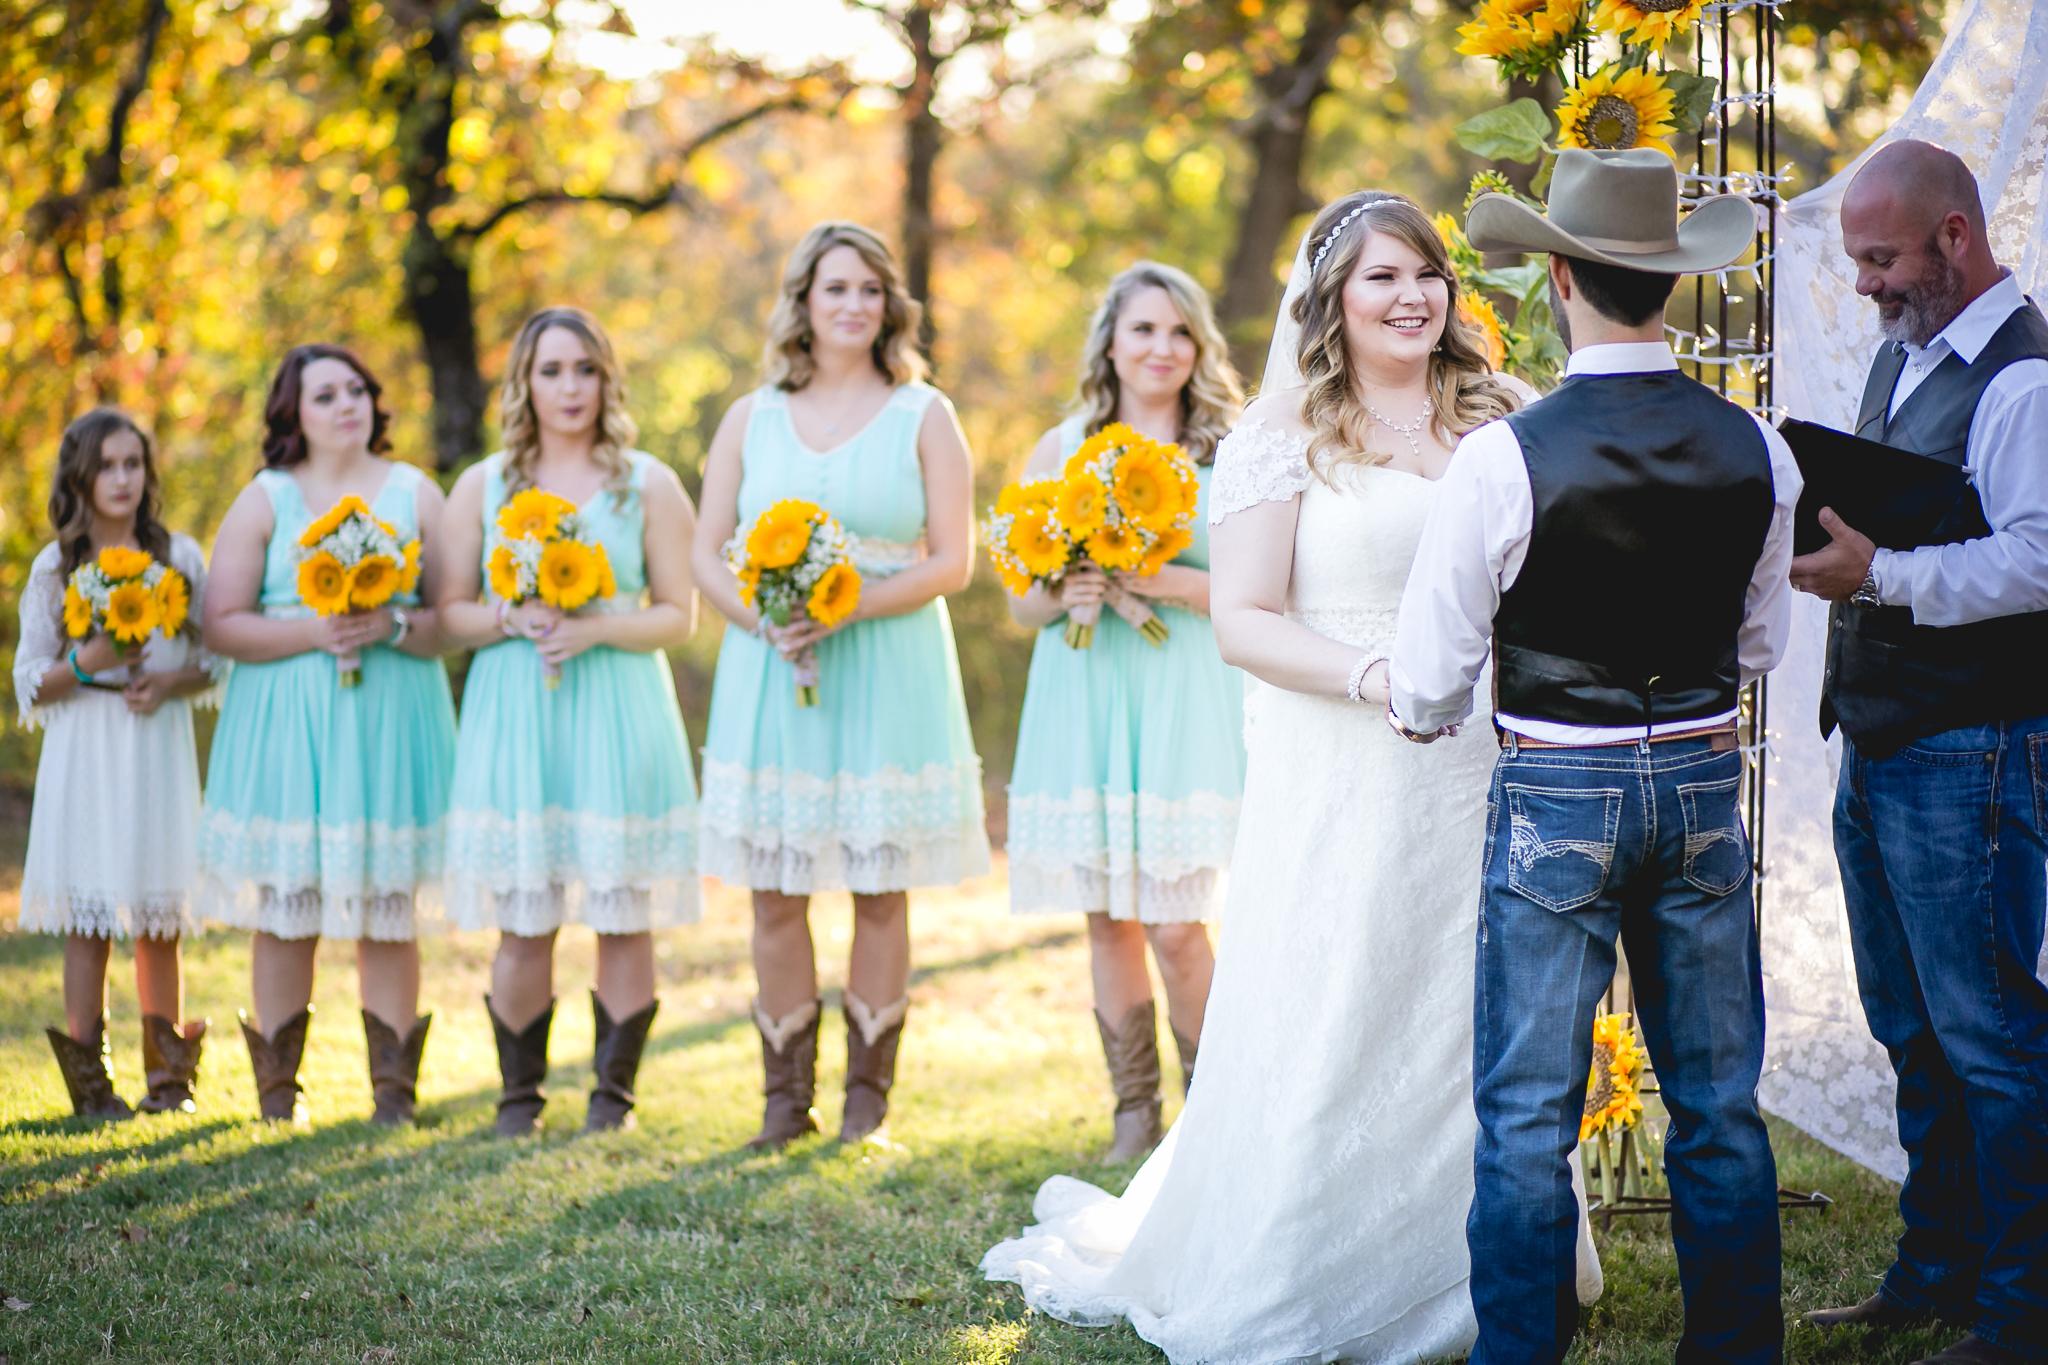 wedding ceremony wedding party